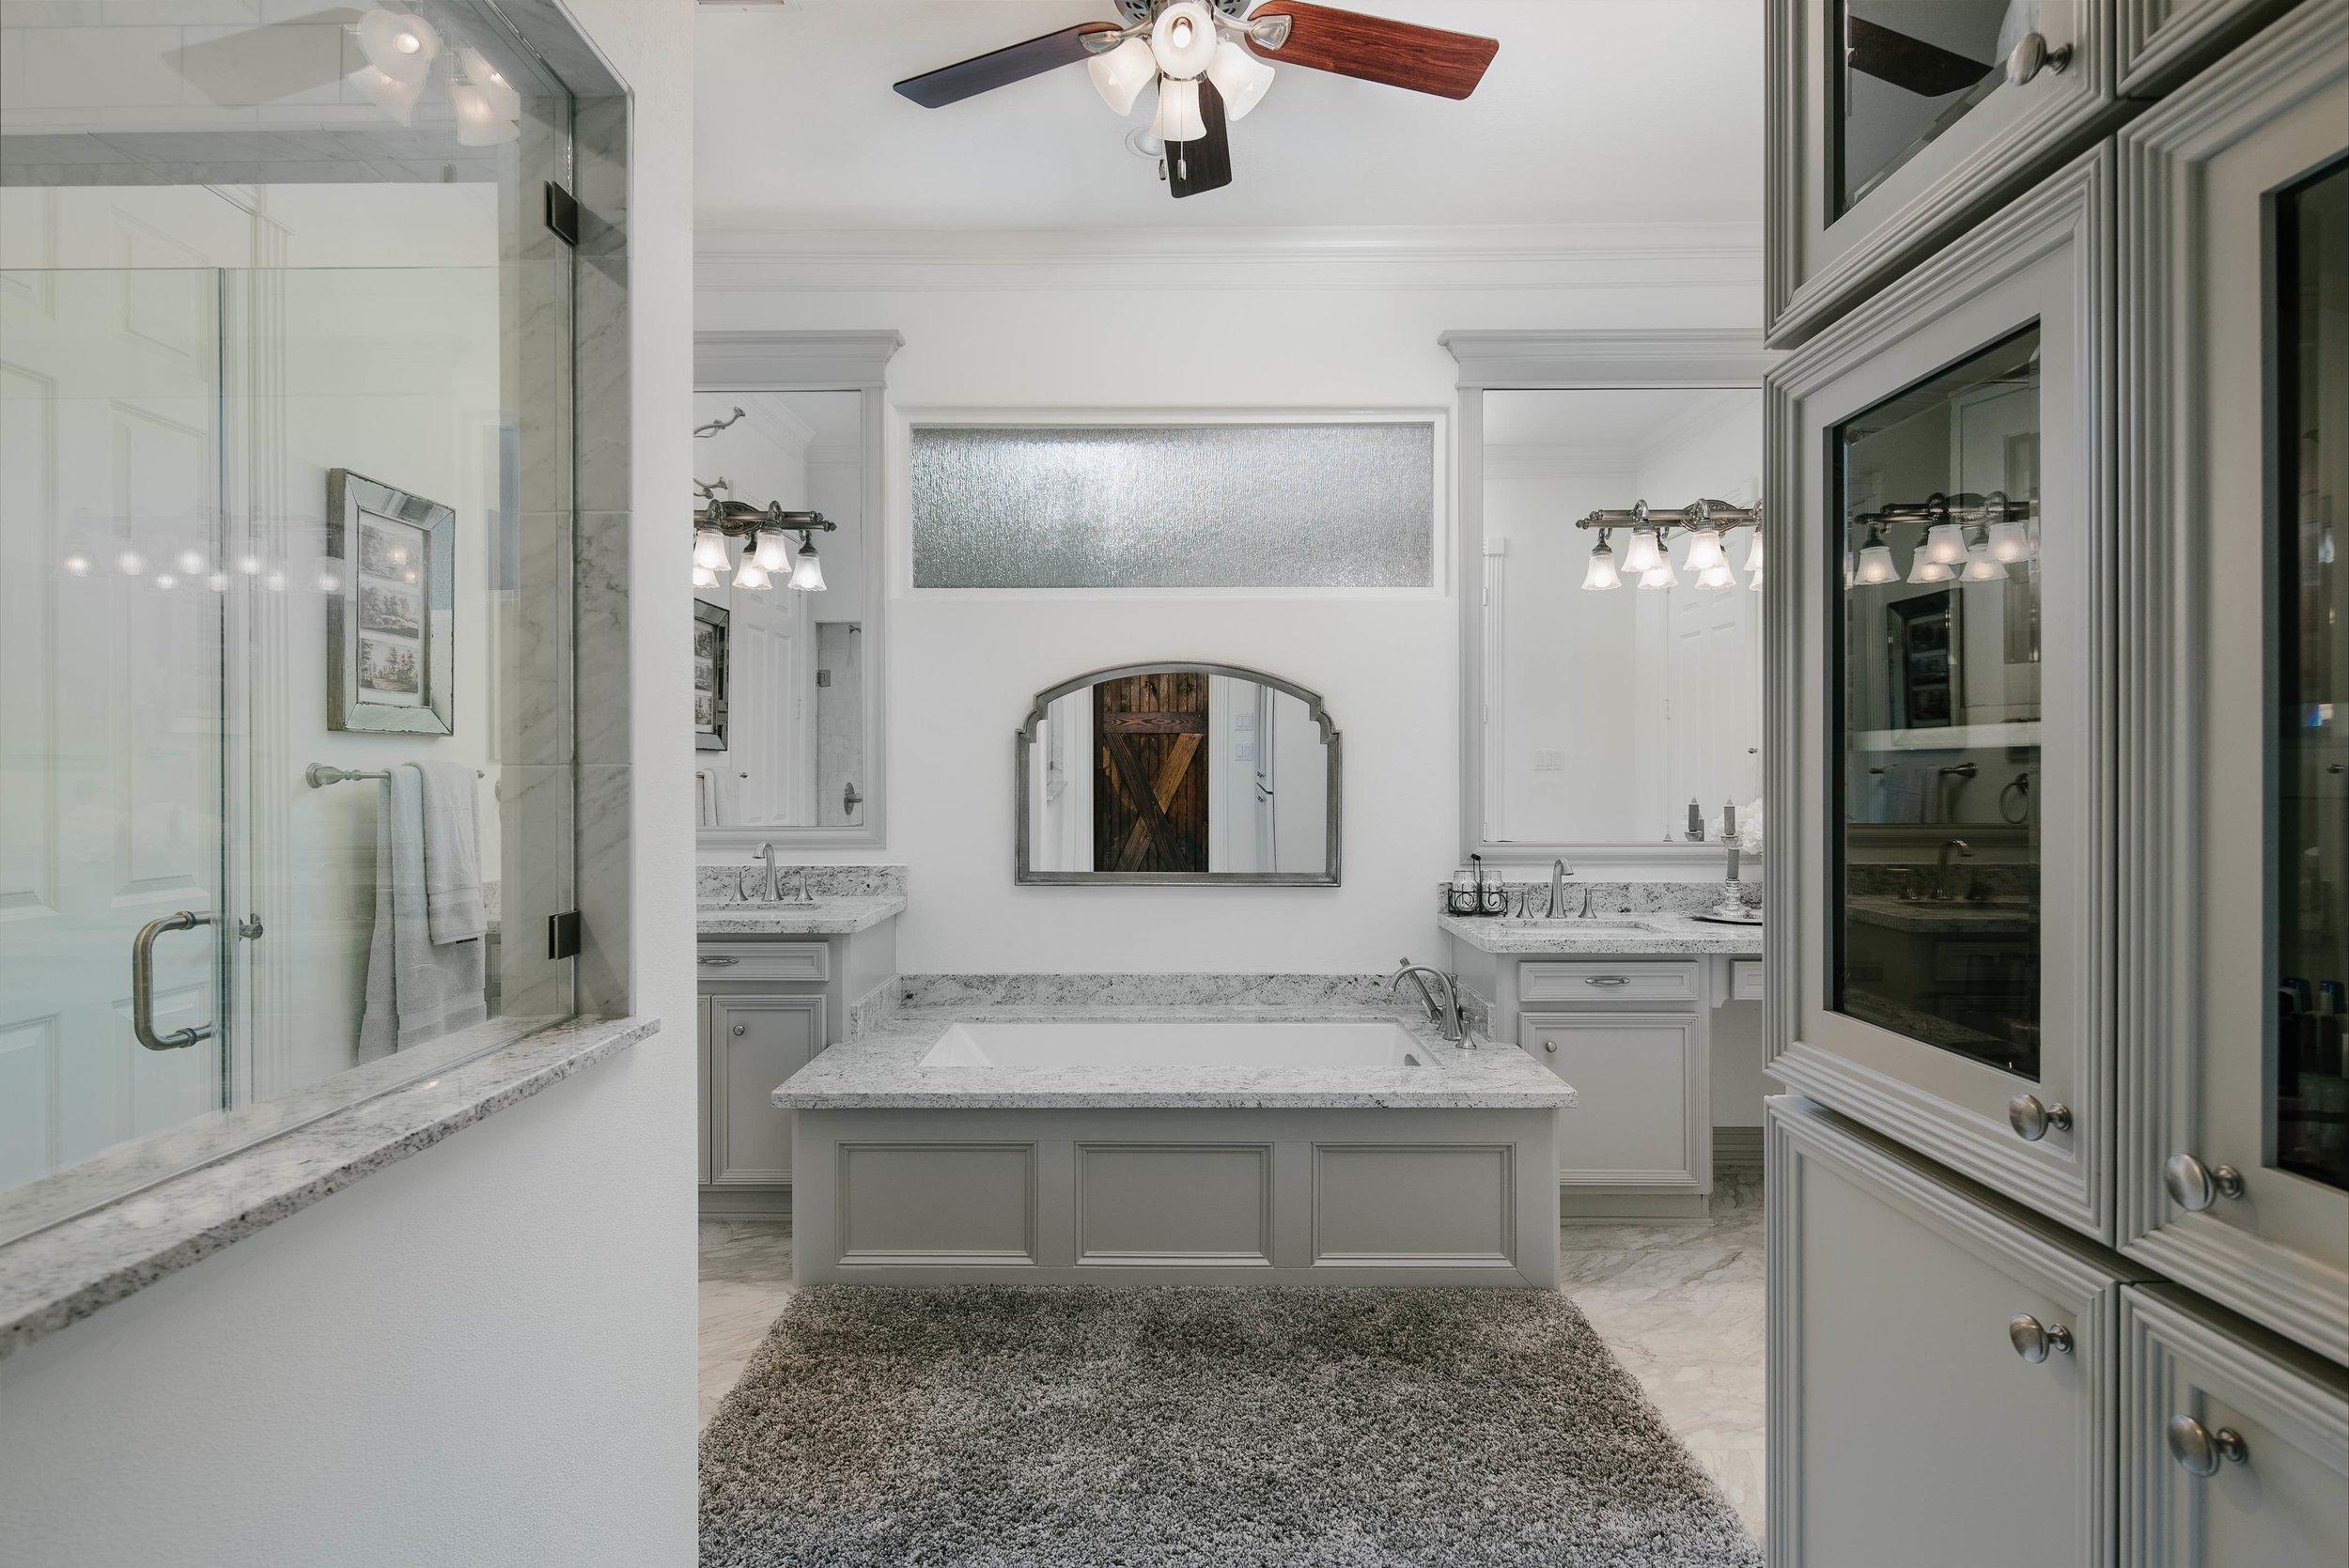 Master bathroom remodel. Grey master bathroom, walk in shower, undermount bathtub, grey marble countertops, white paint, grey paint, grey tile, subway tile.